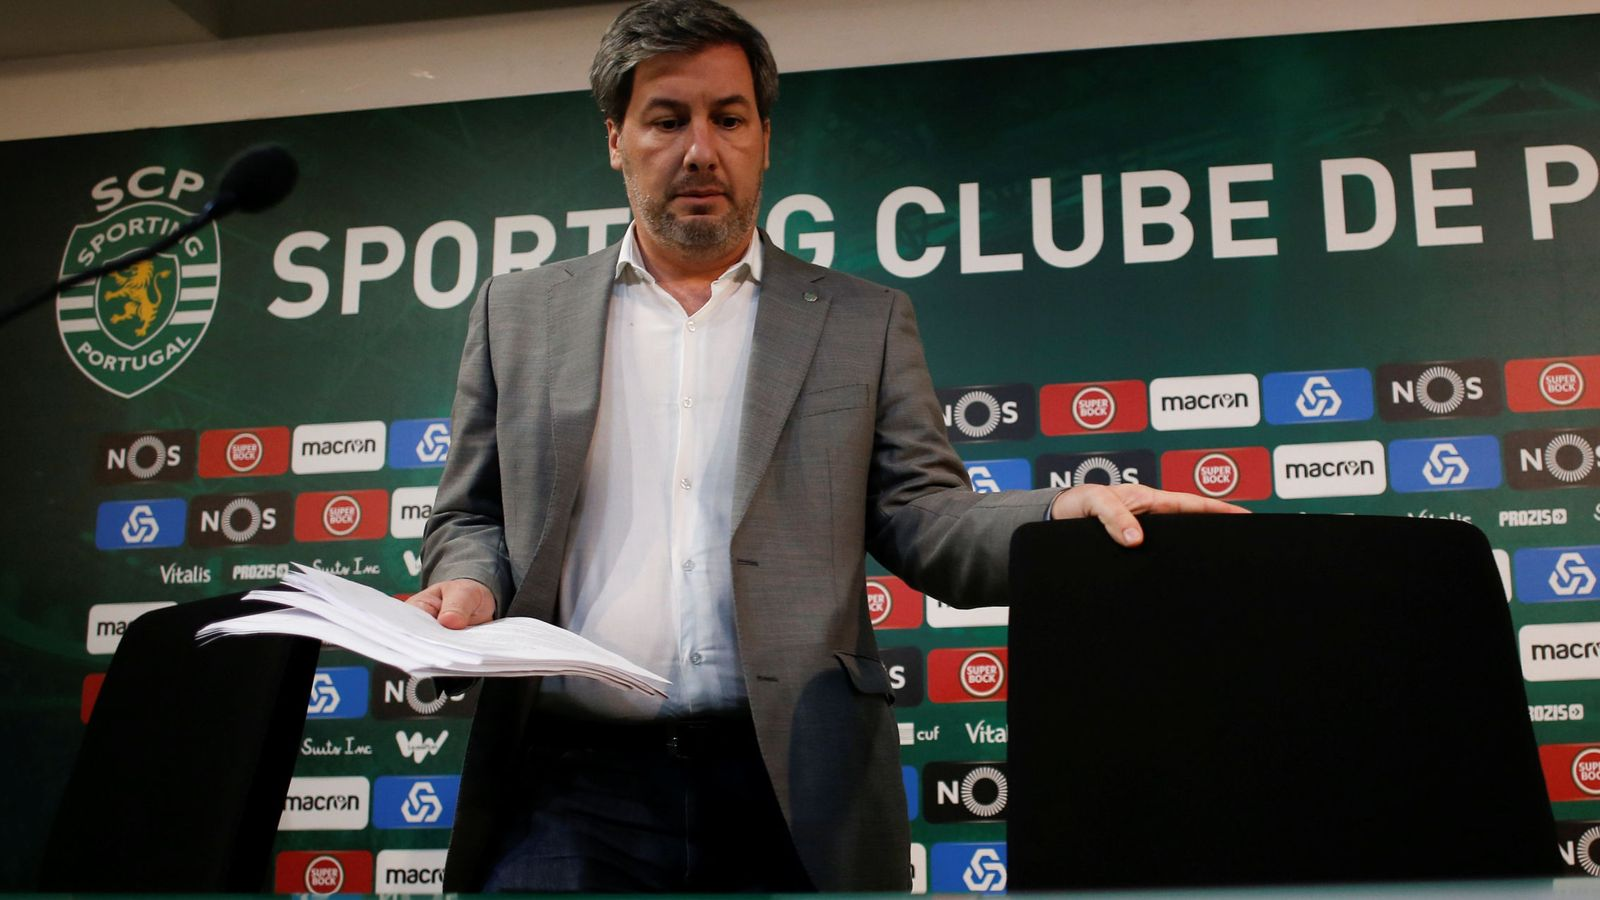 Foto: Bruno de Carvalho, expresidente del Sporting. (Reuters)